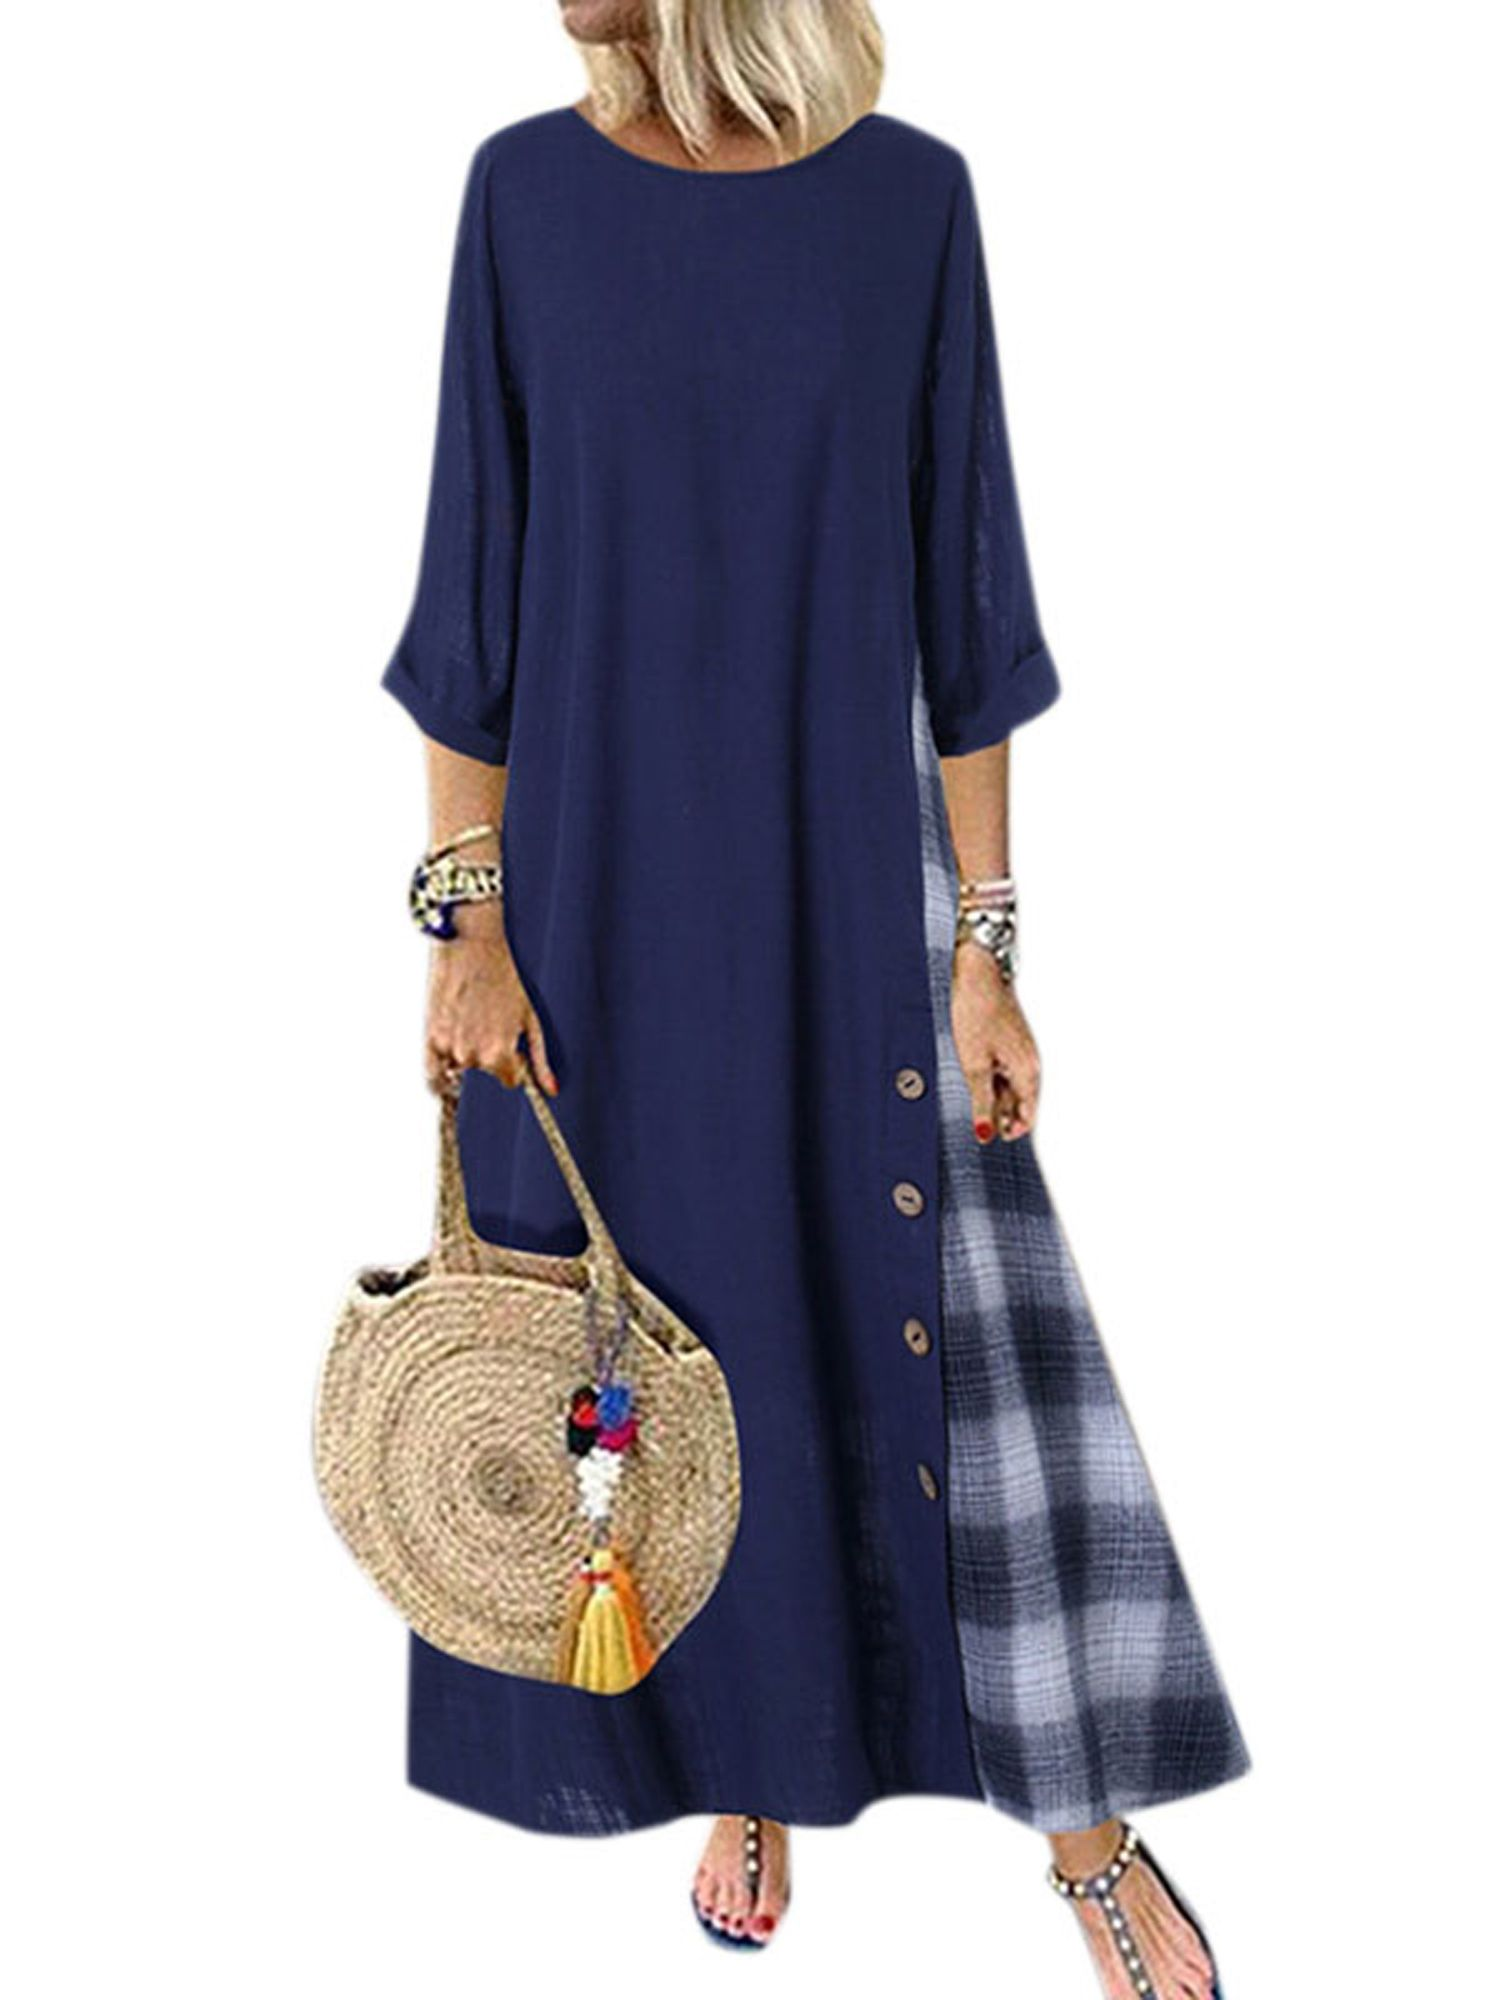 Wodstyle Women S Plus Size 3 4 Sleeve Casual Plaid Loose Kaftan Long Maxi Dress Walmart Com Plus Size Maxi Dresses A Line Dress Street Chic [ 2000 x 1500 Pixel ]